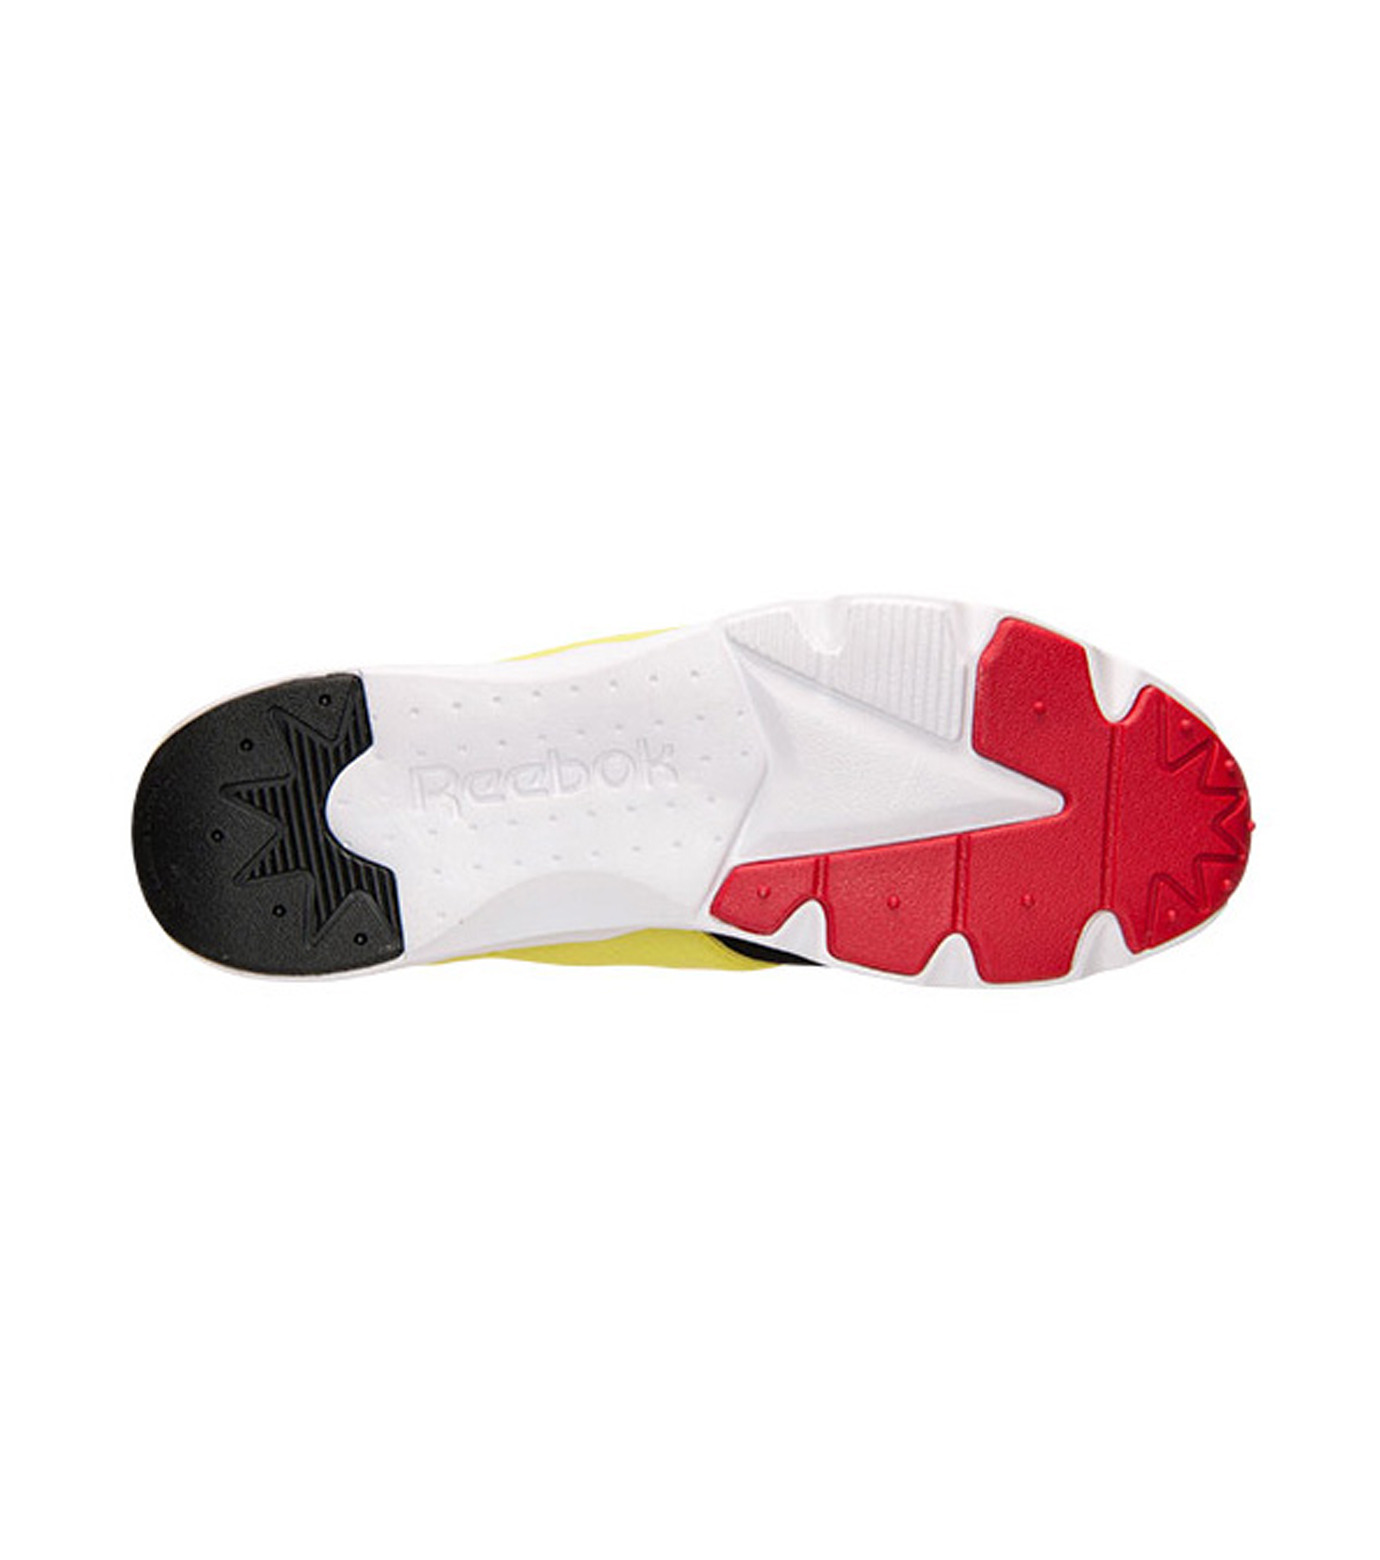 Reebok(リーボック)のFURYLITE-BLACK(シューズ/shoes)-V66618-13 拡大詳細画像2